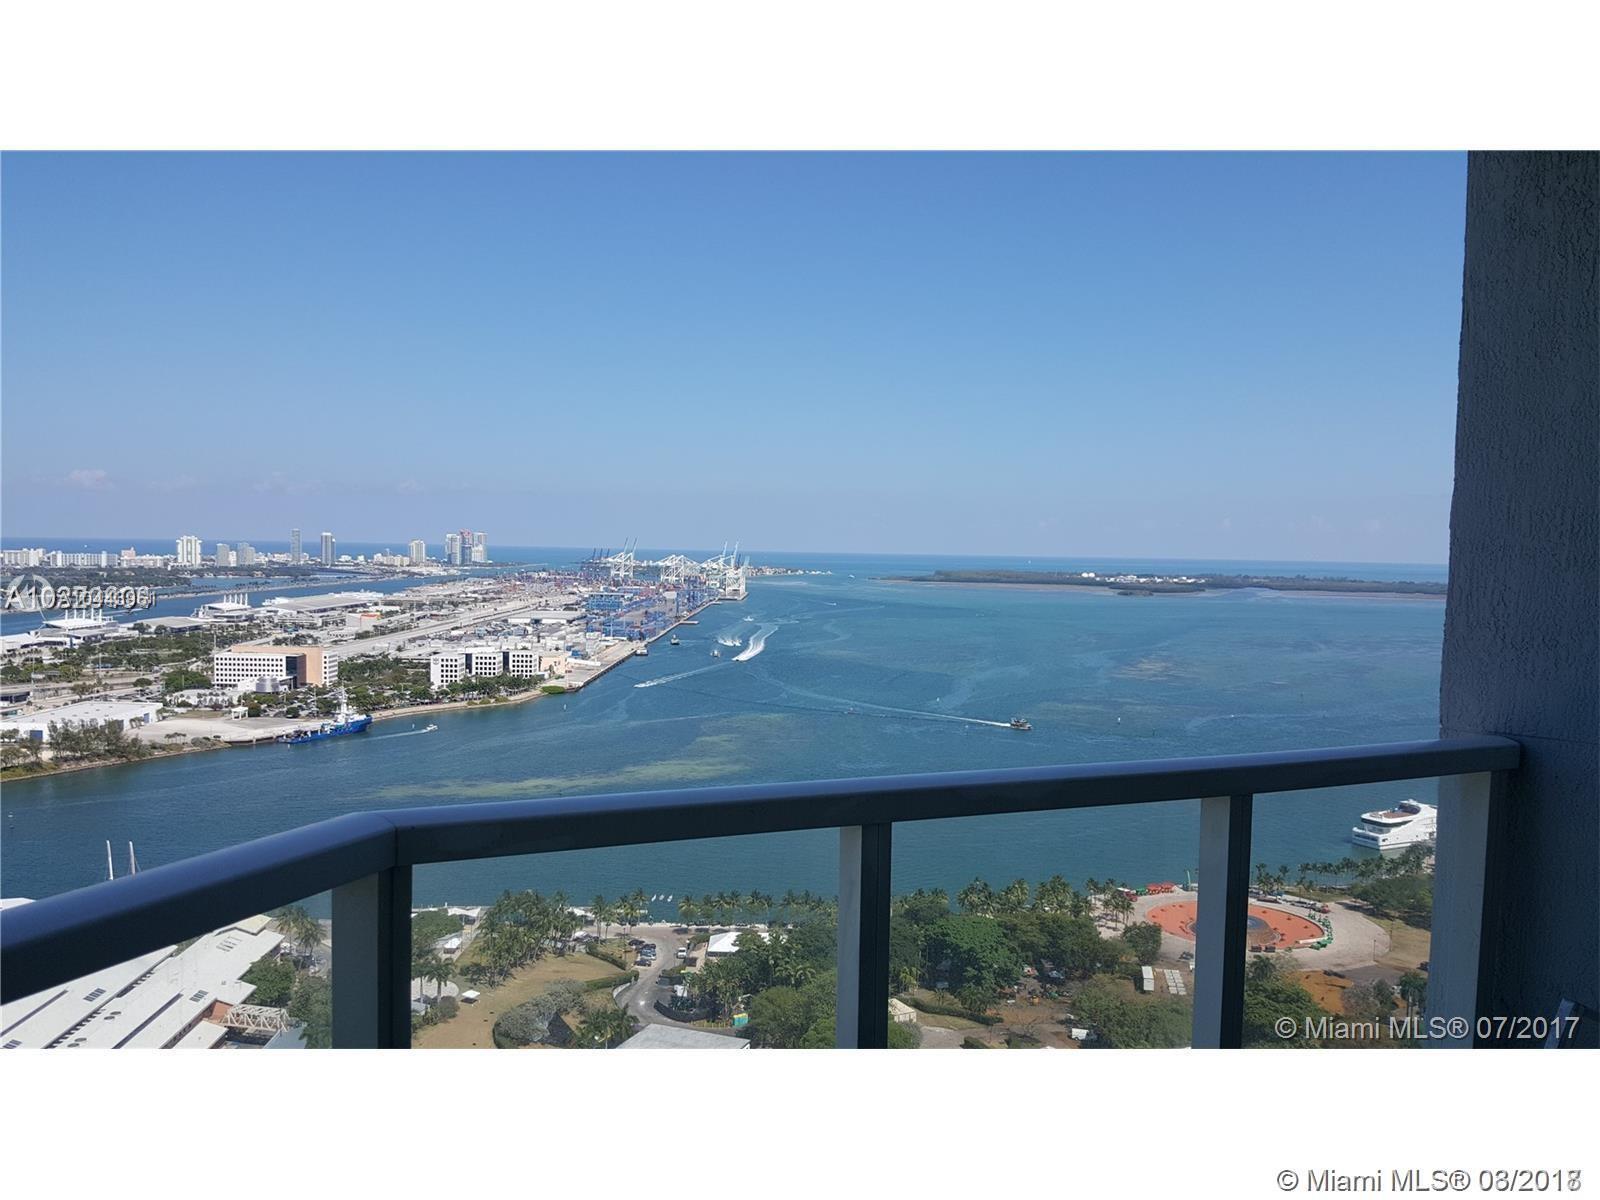 244 Biscayne Blvd # 3702, Miami, Florida 33132, 2 Bedrooms Bedrooms, ,2 BathroomsBathrooms,Residential,For Sale,244 Biscayne Blvd # 3702,A10443961